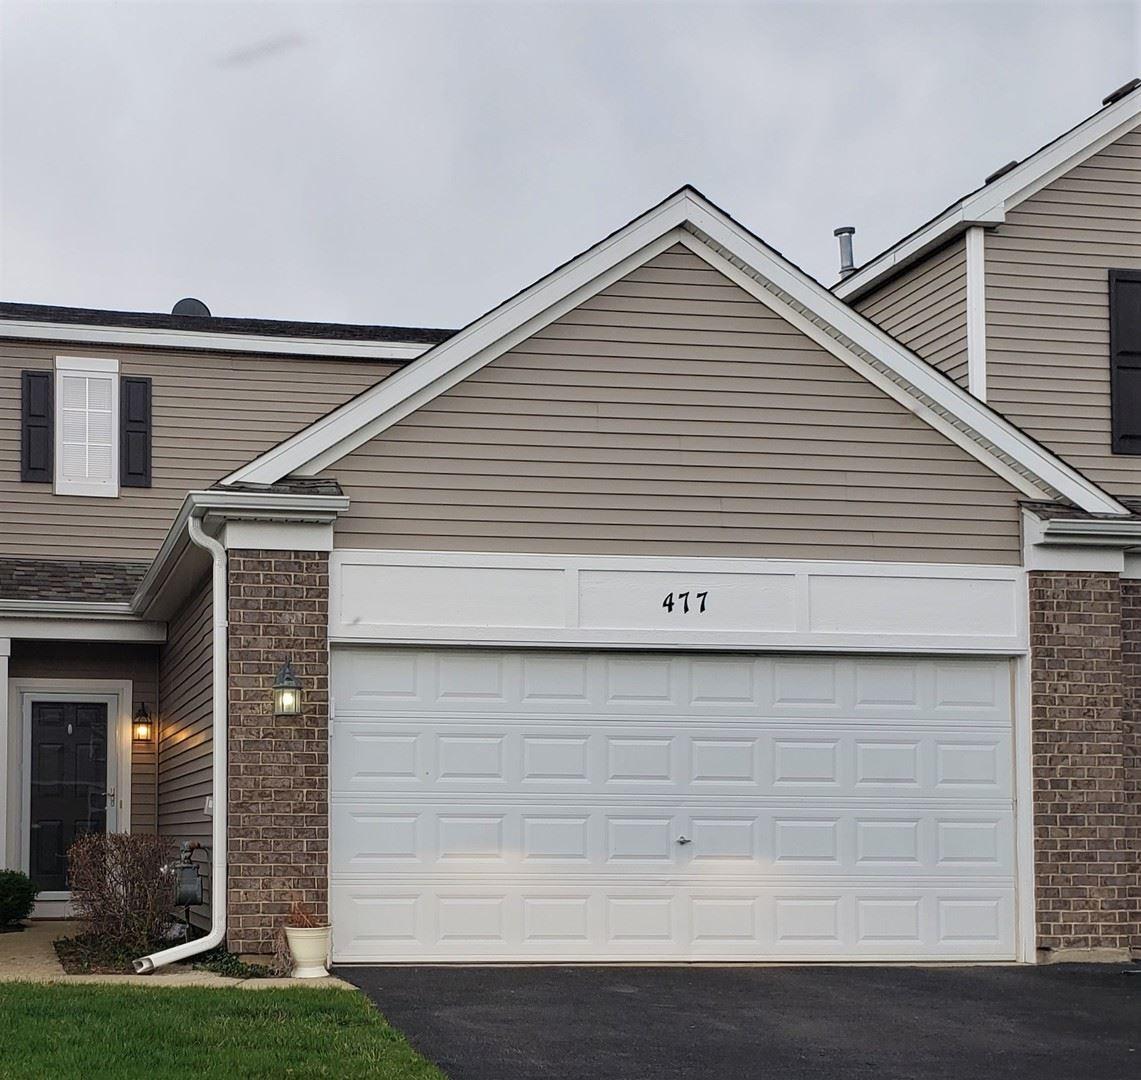 Photo of 477 Brookside Drive, Oswego, IL 60543 (MLS # 11043391)